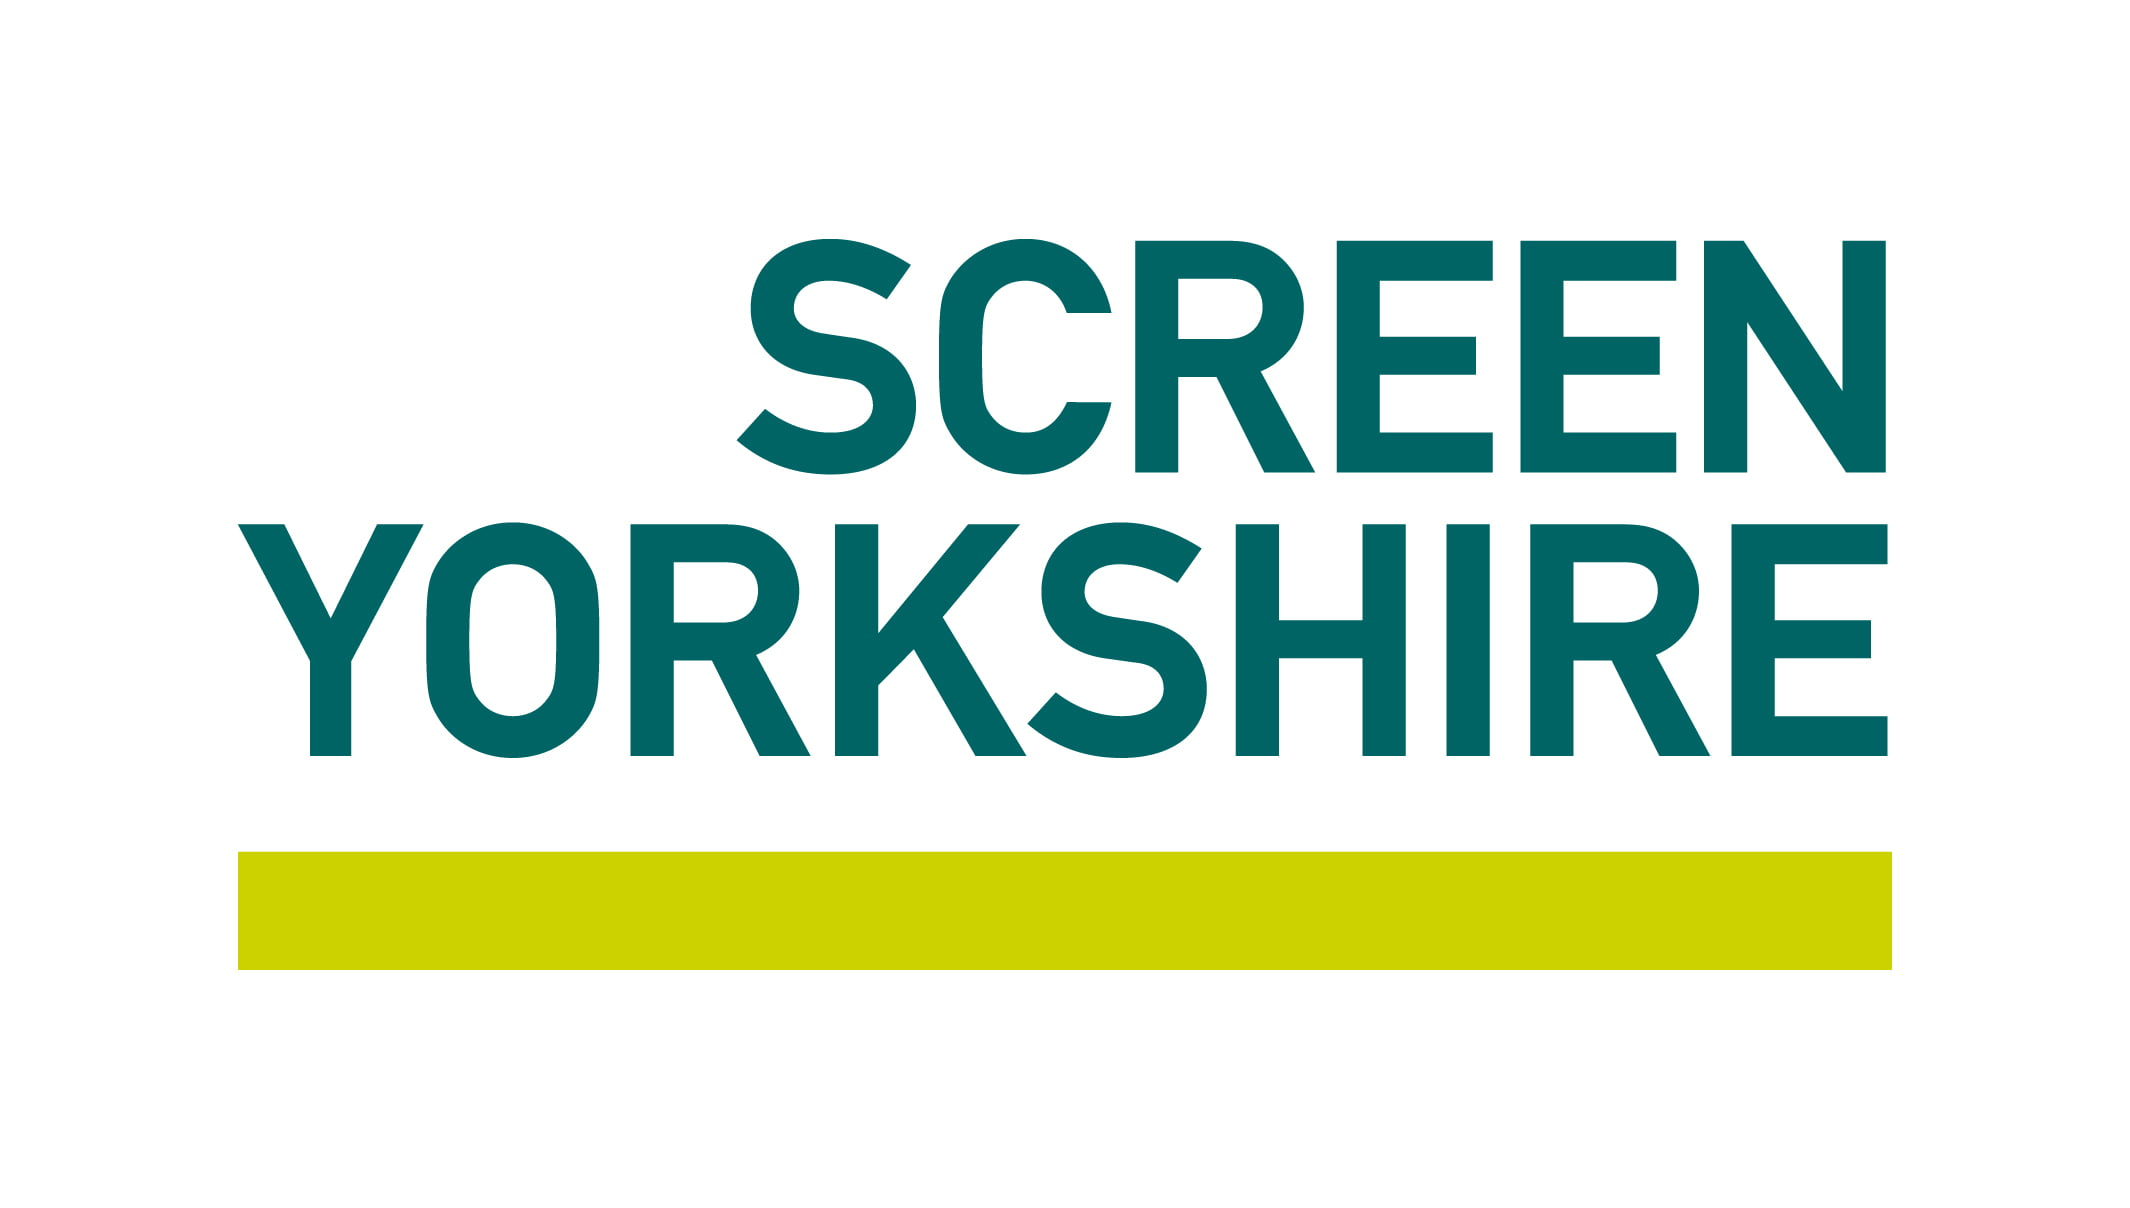 Screen Yorkshire